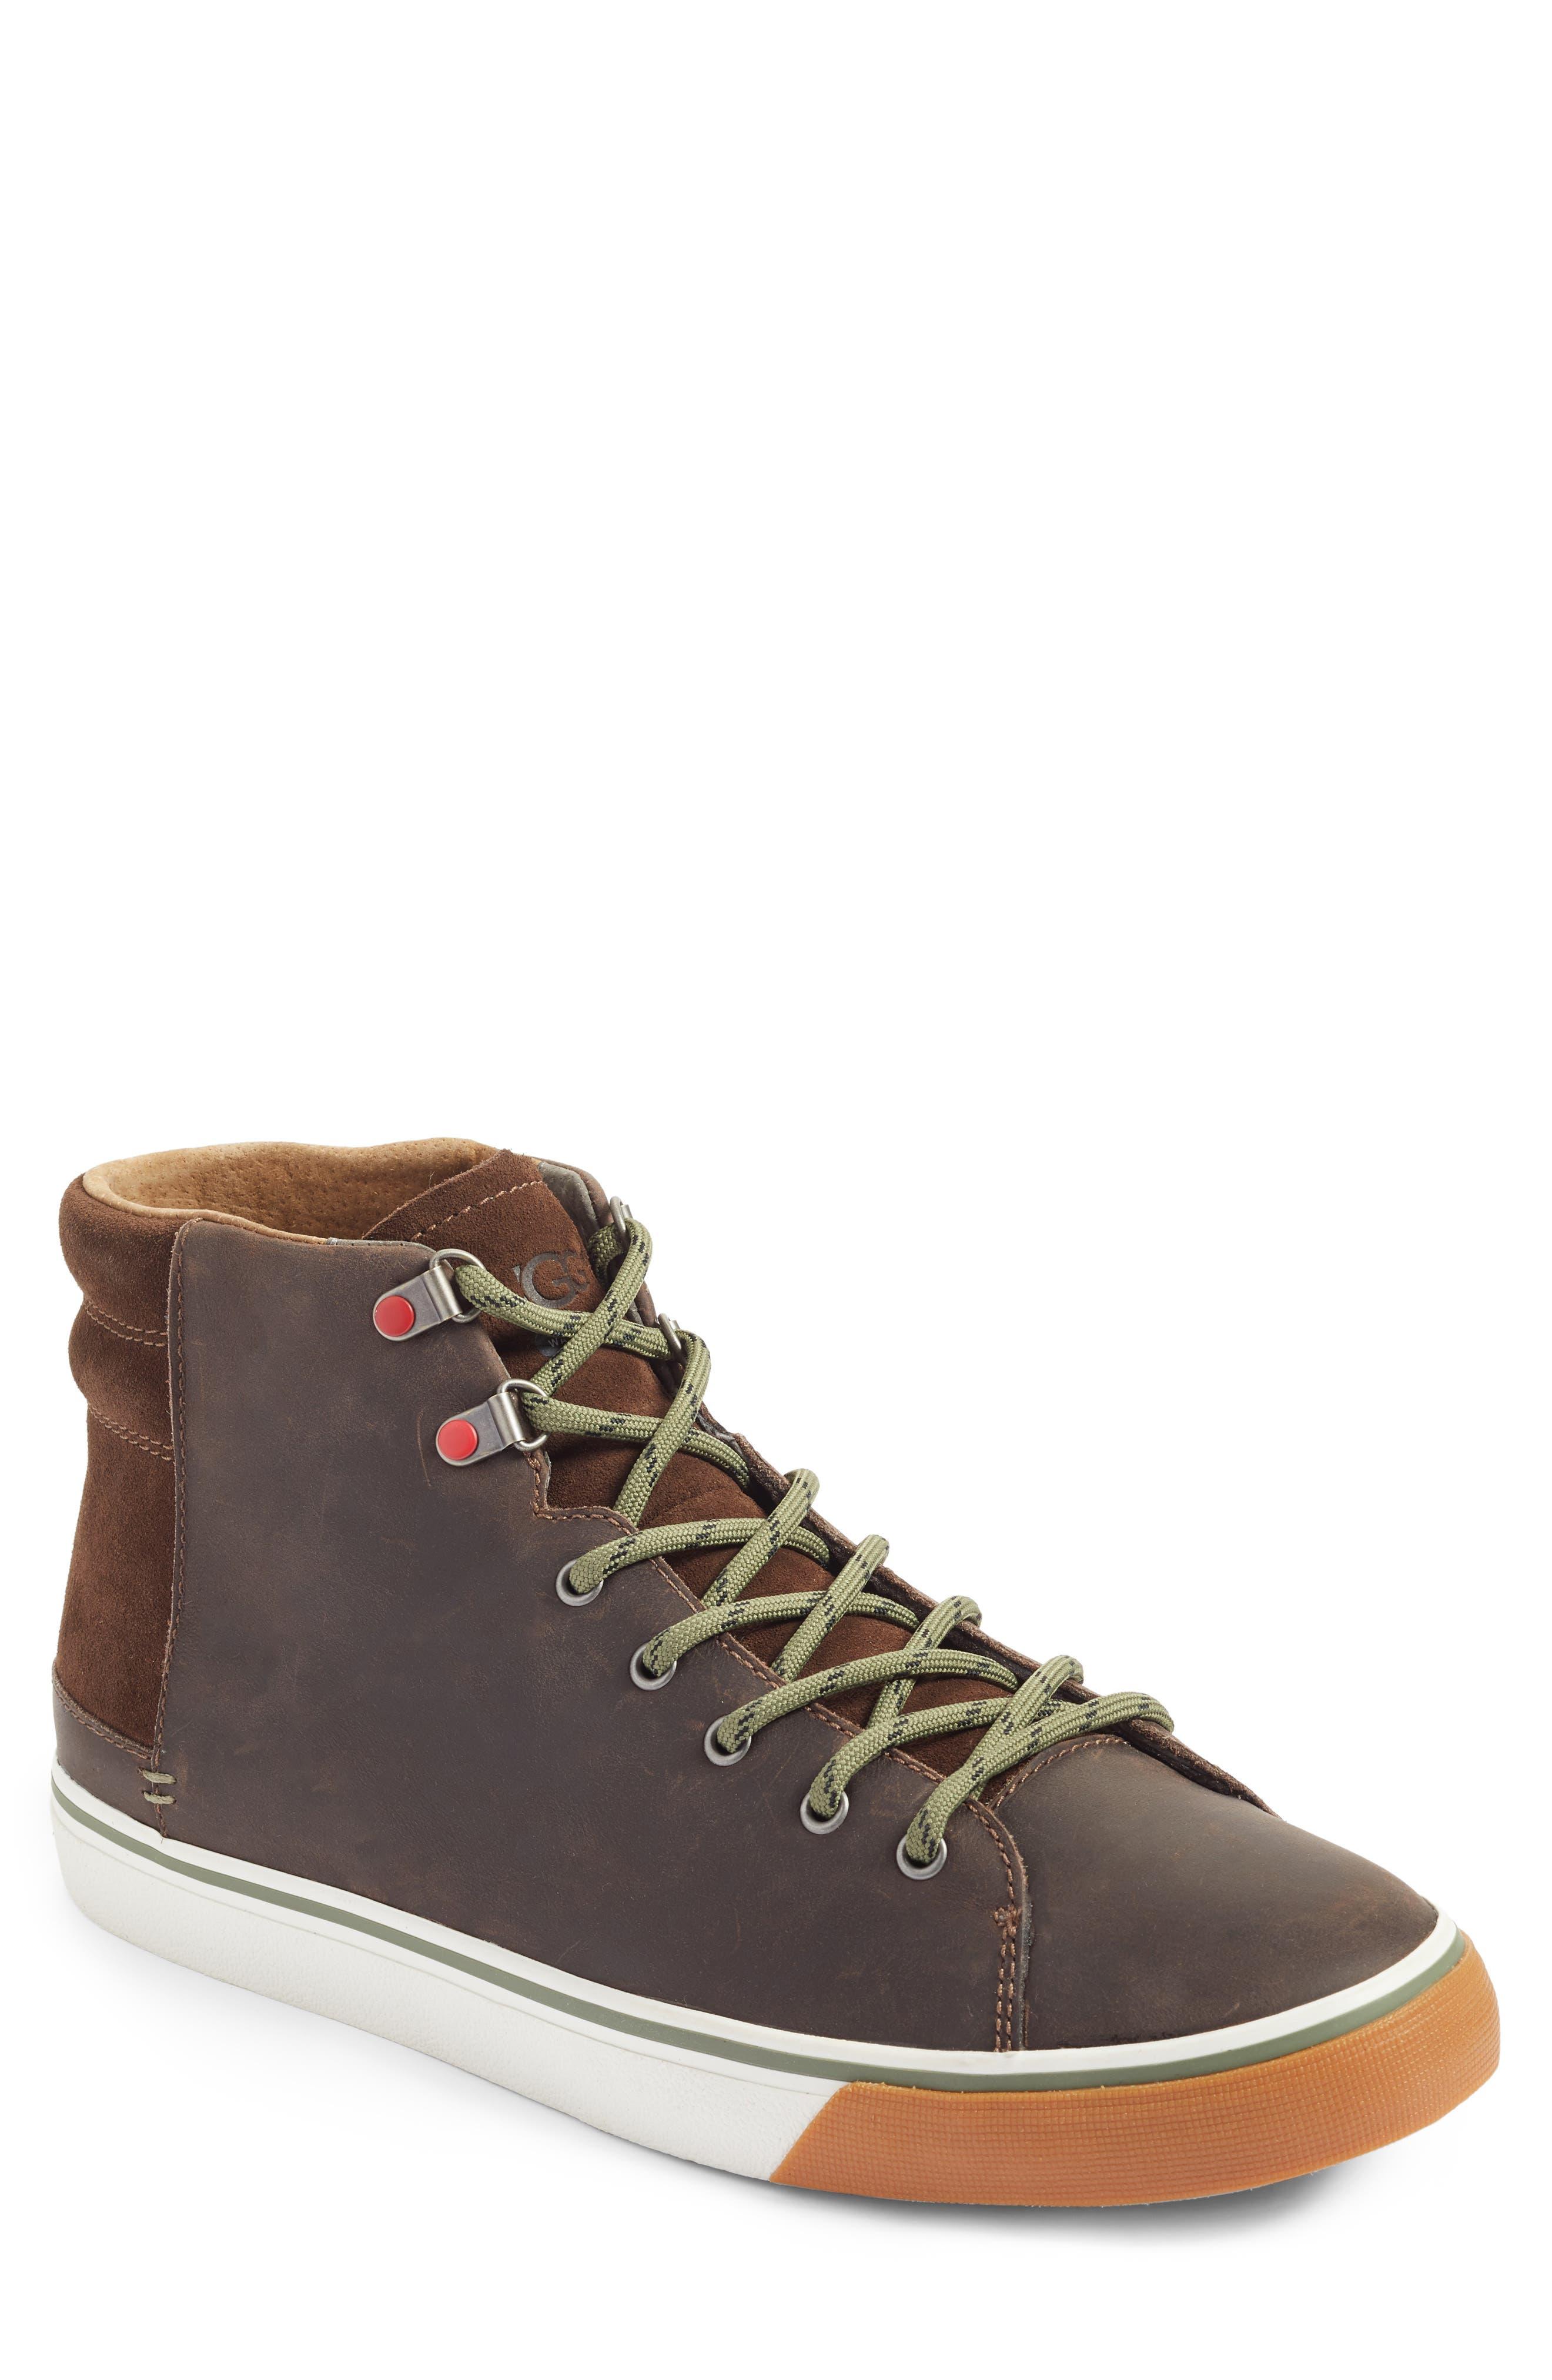 Hoyt High Top Sneaker,                             Main thumbnail 2, color,